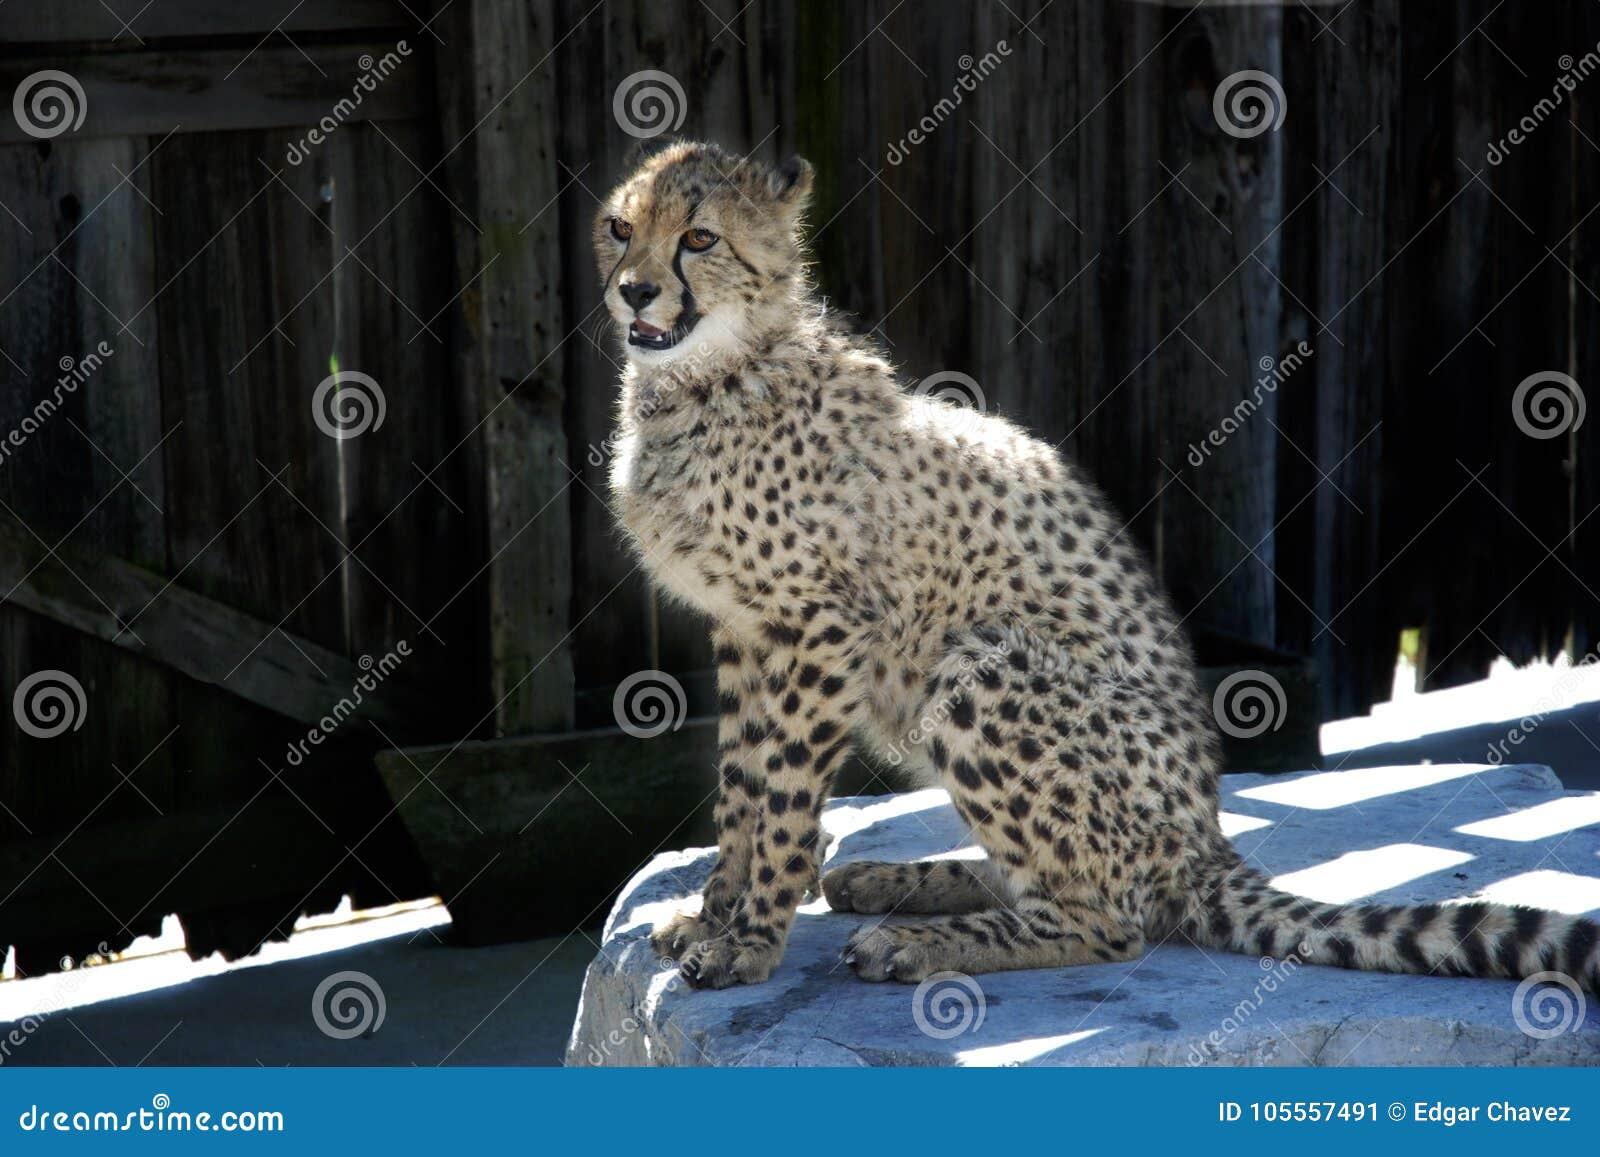 Cheetah on a rock